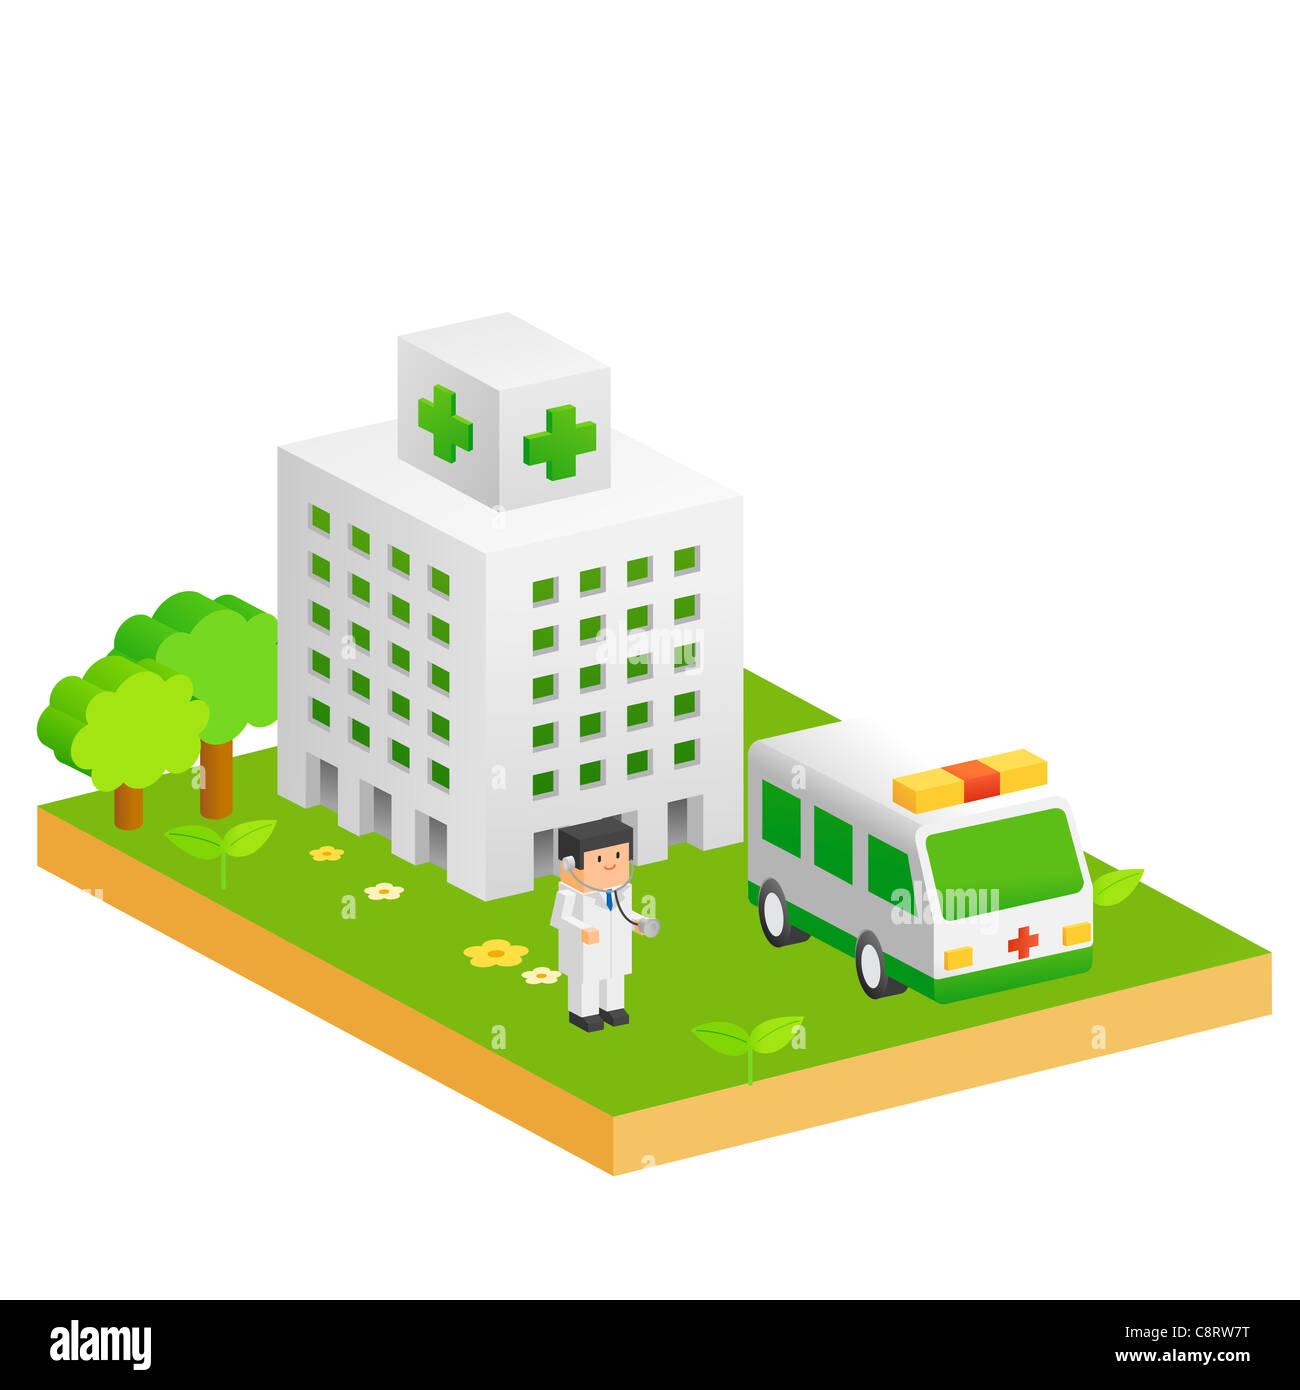 Hospital, Doctor And Ambulance - Stock Image